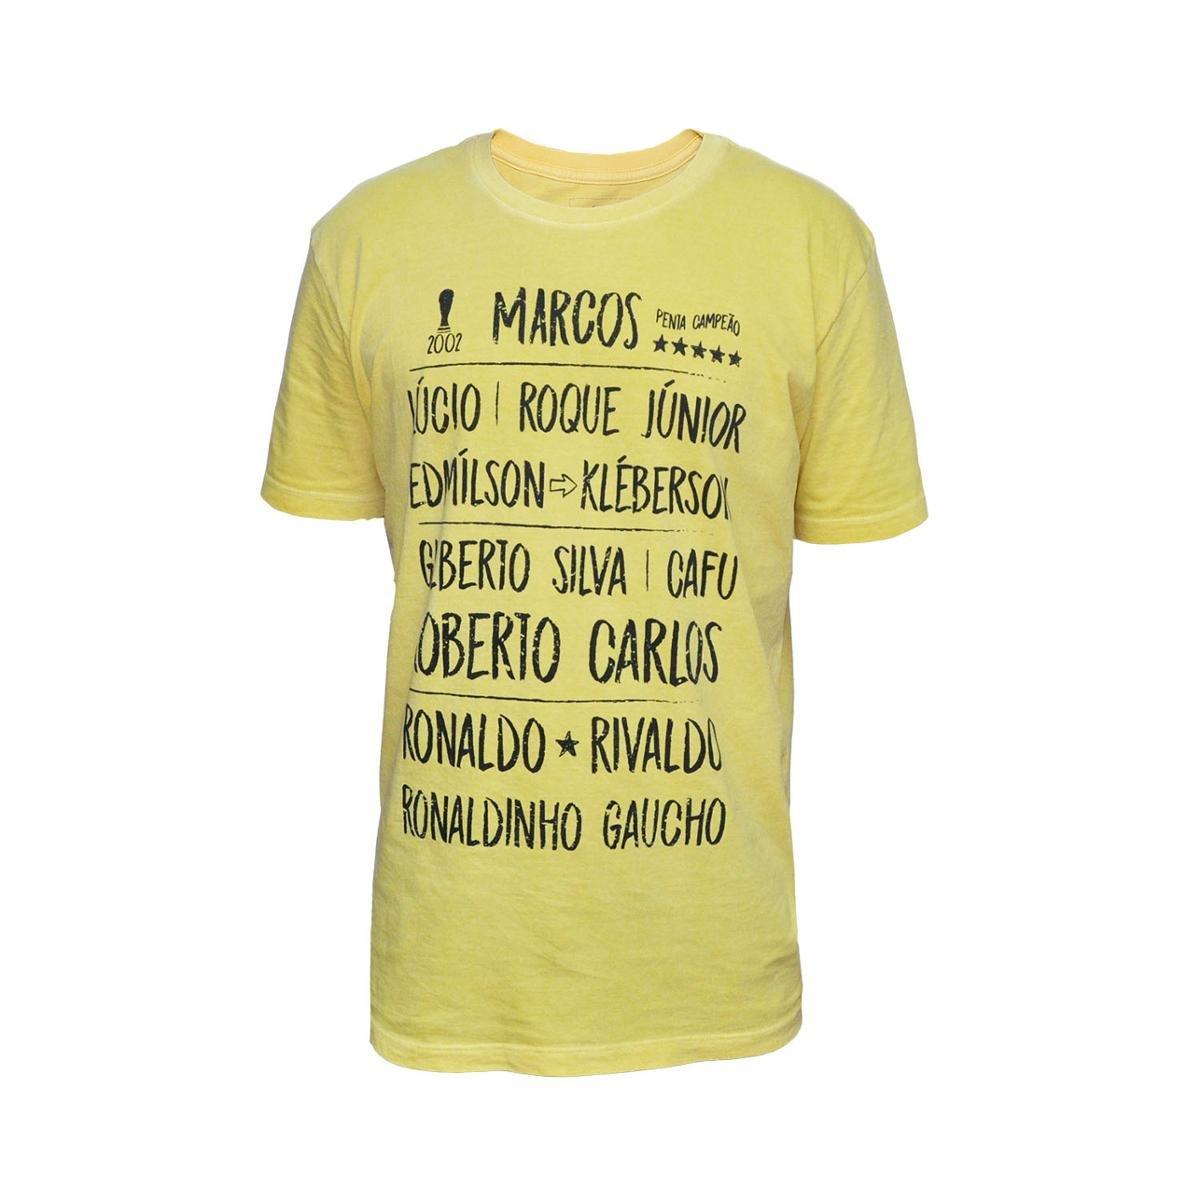 Camisa Brasil 2002 Retrô Mania Masculina Amarela